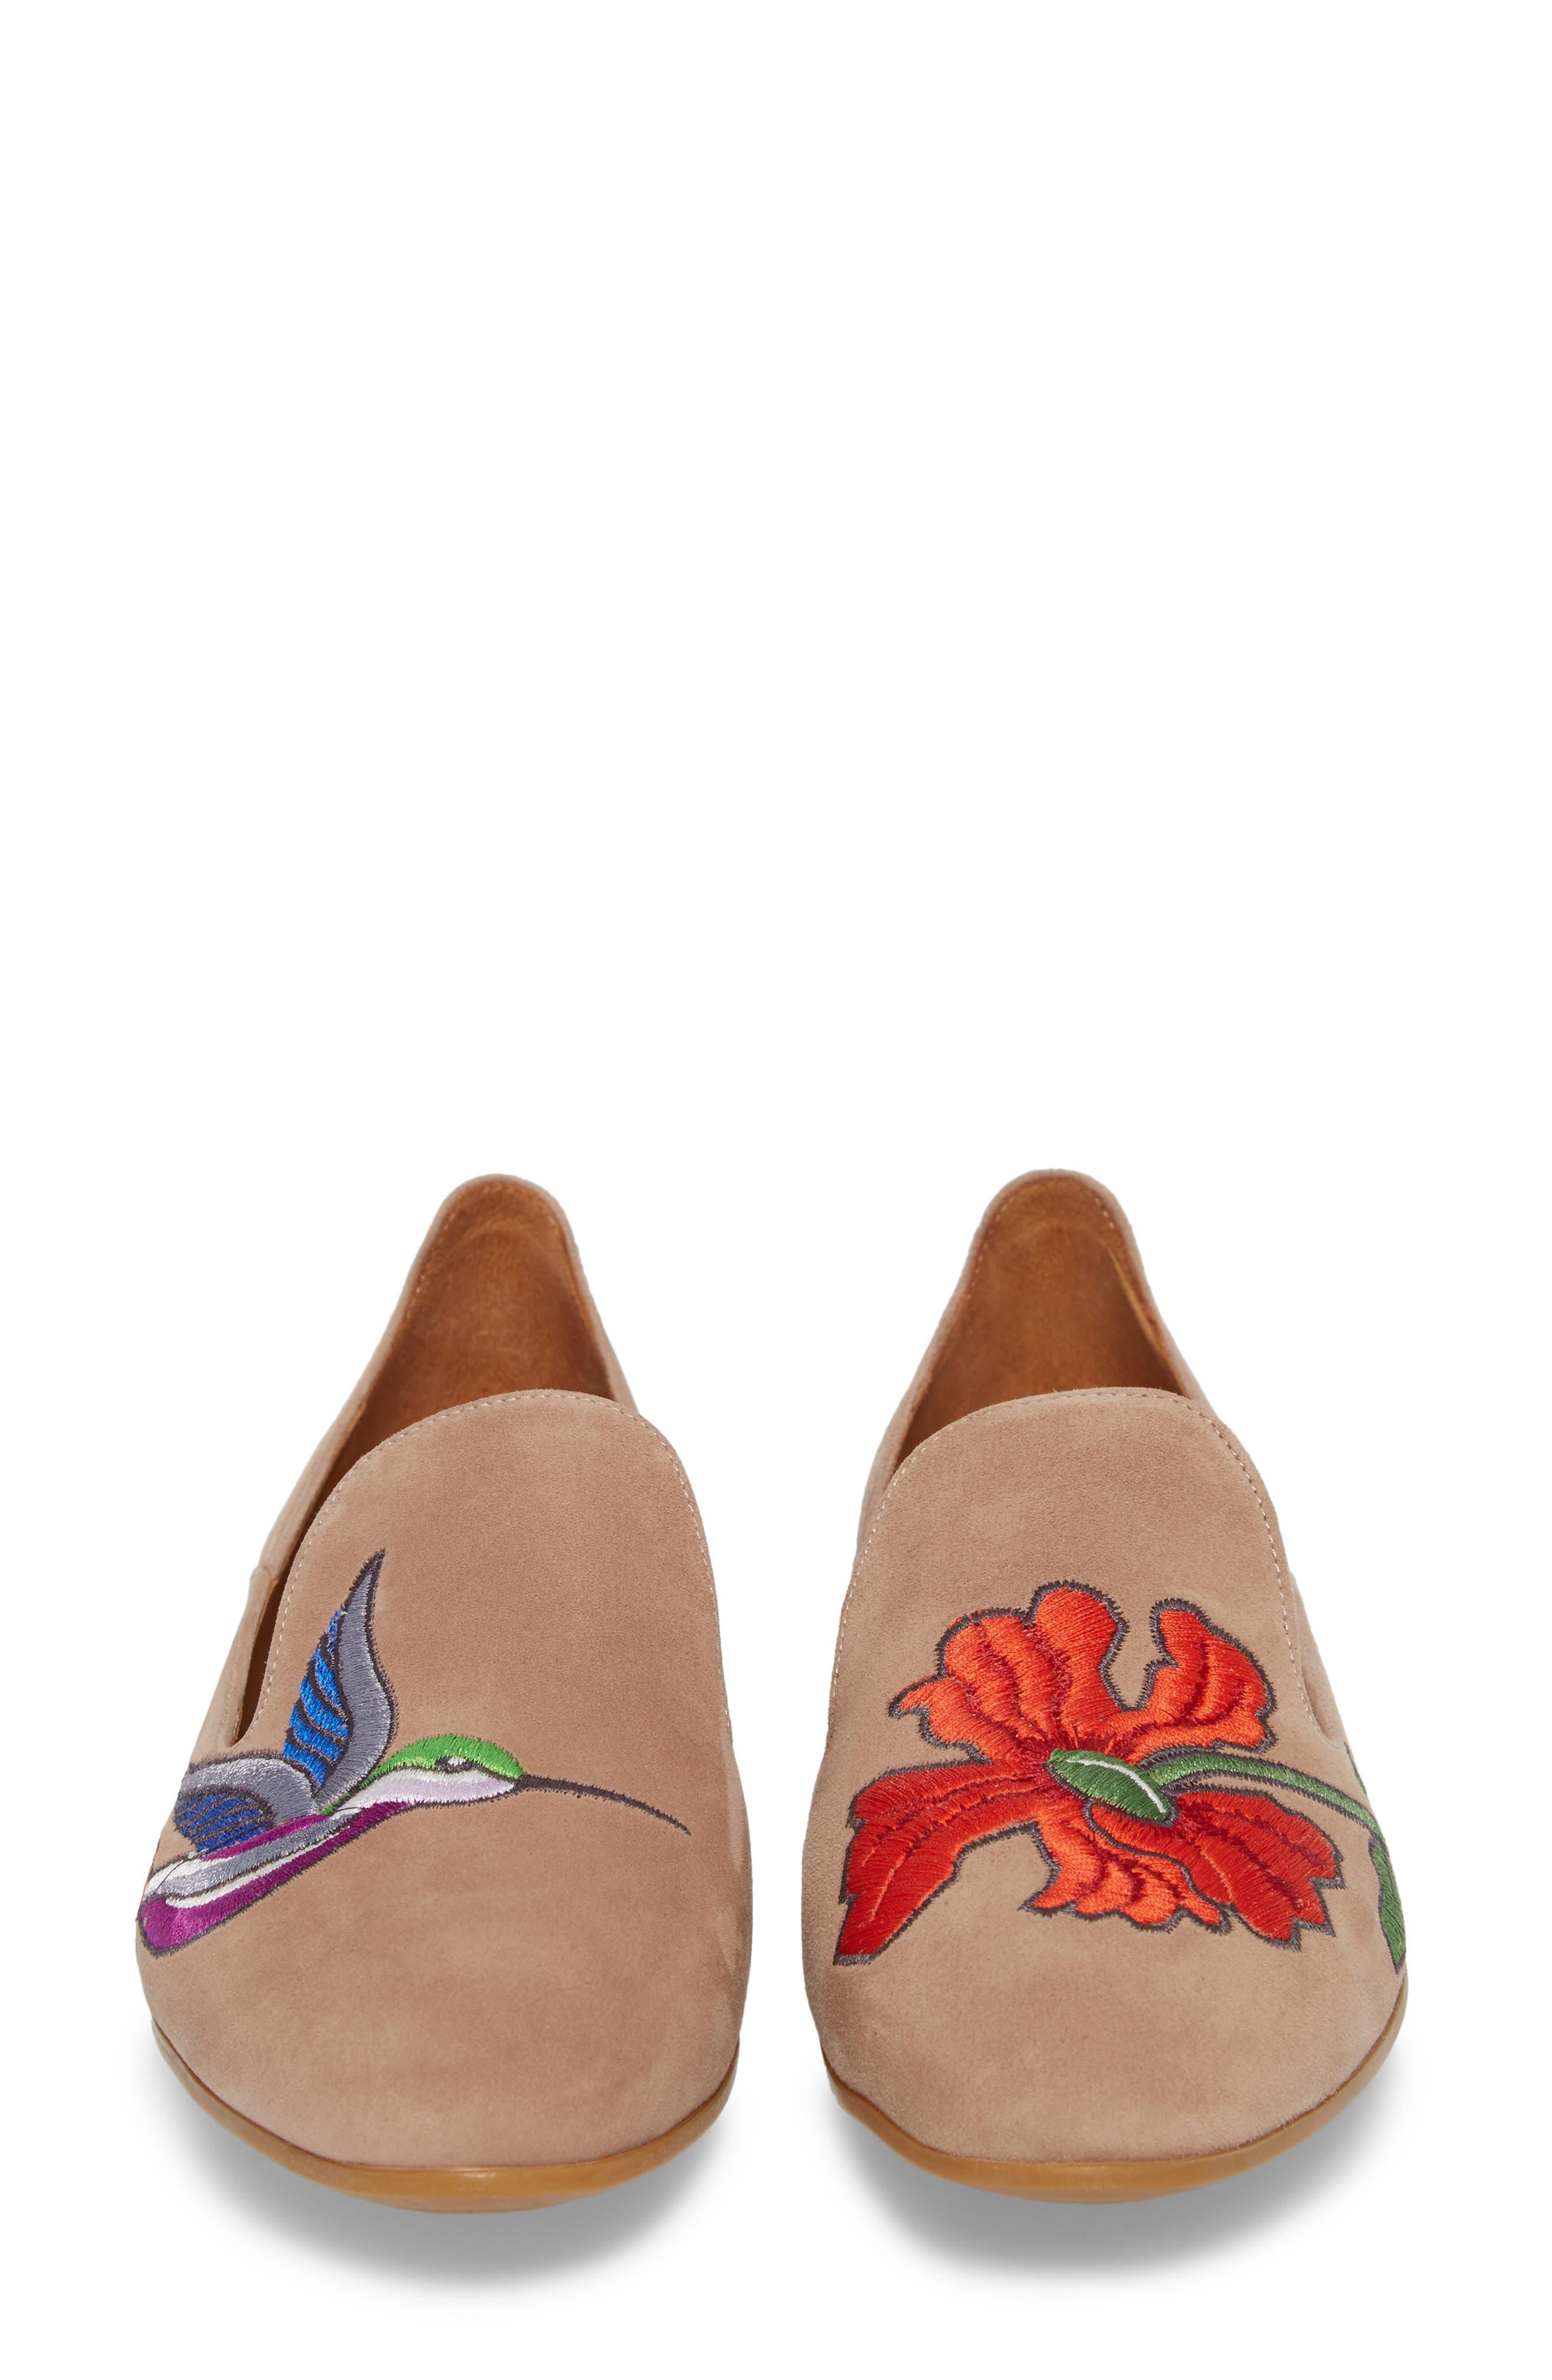 Emmaline Embroidered Loafer,                             Alternate thumbnail 14, color,